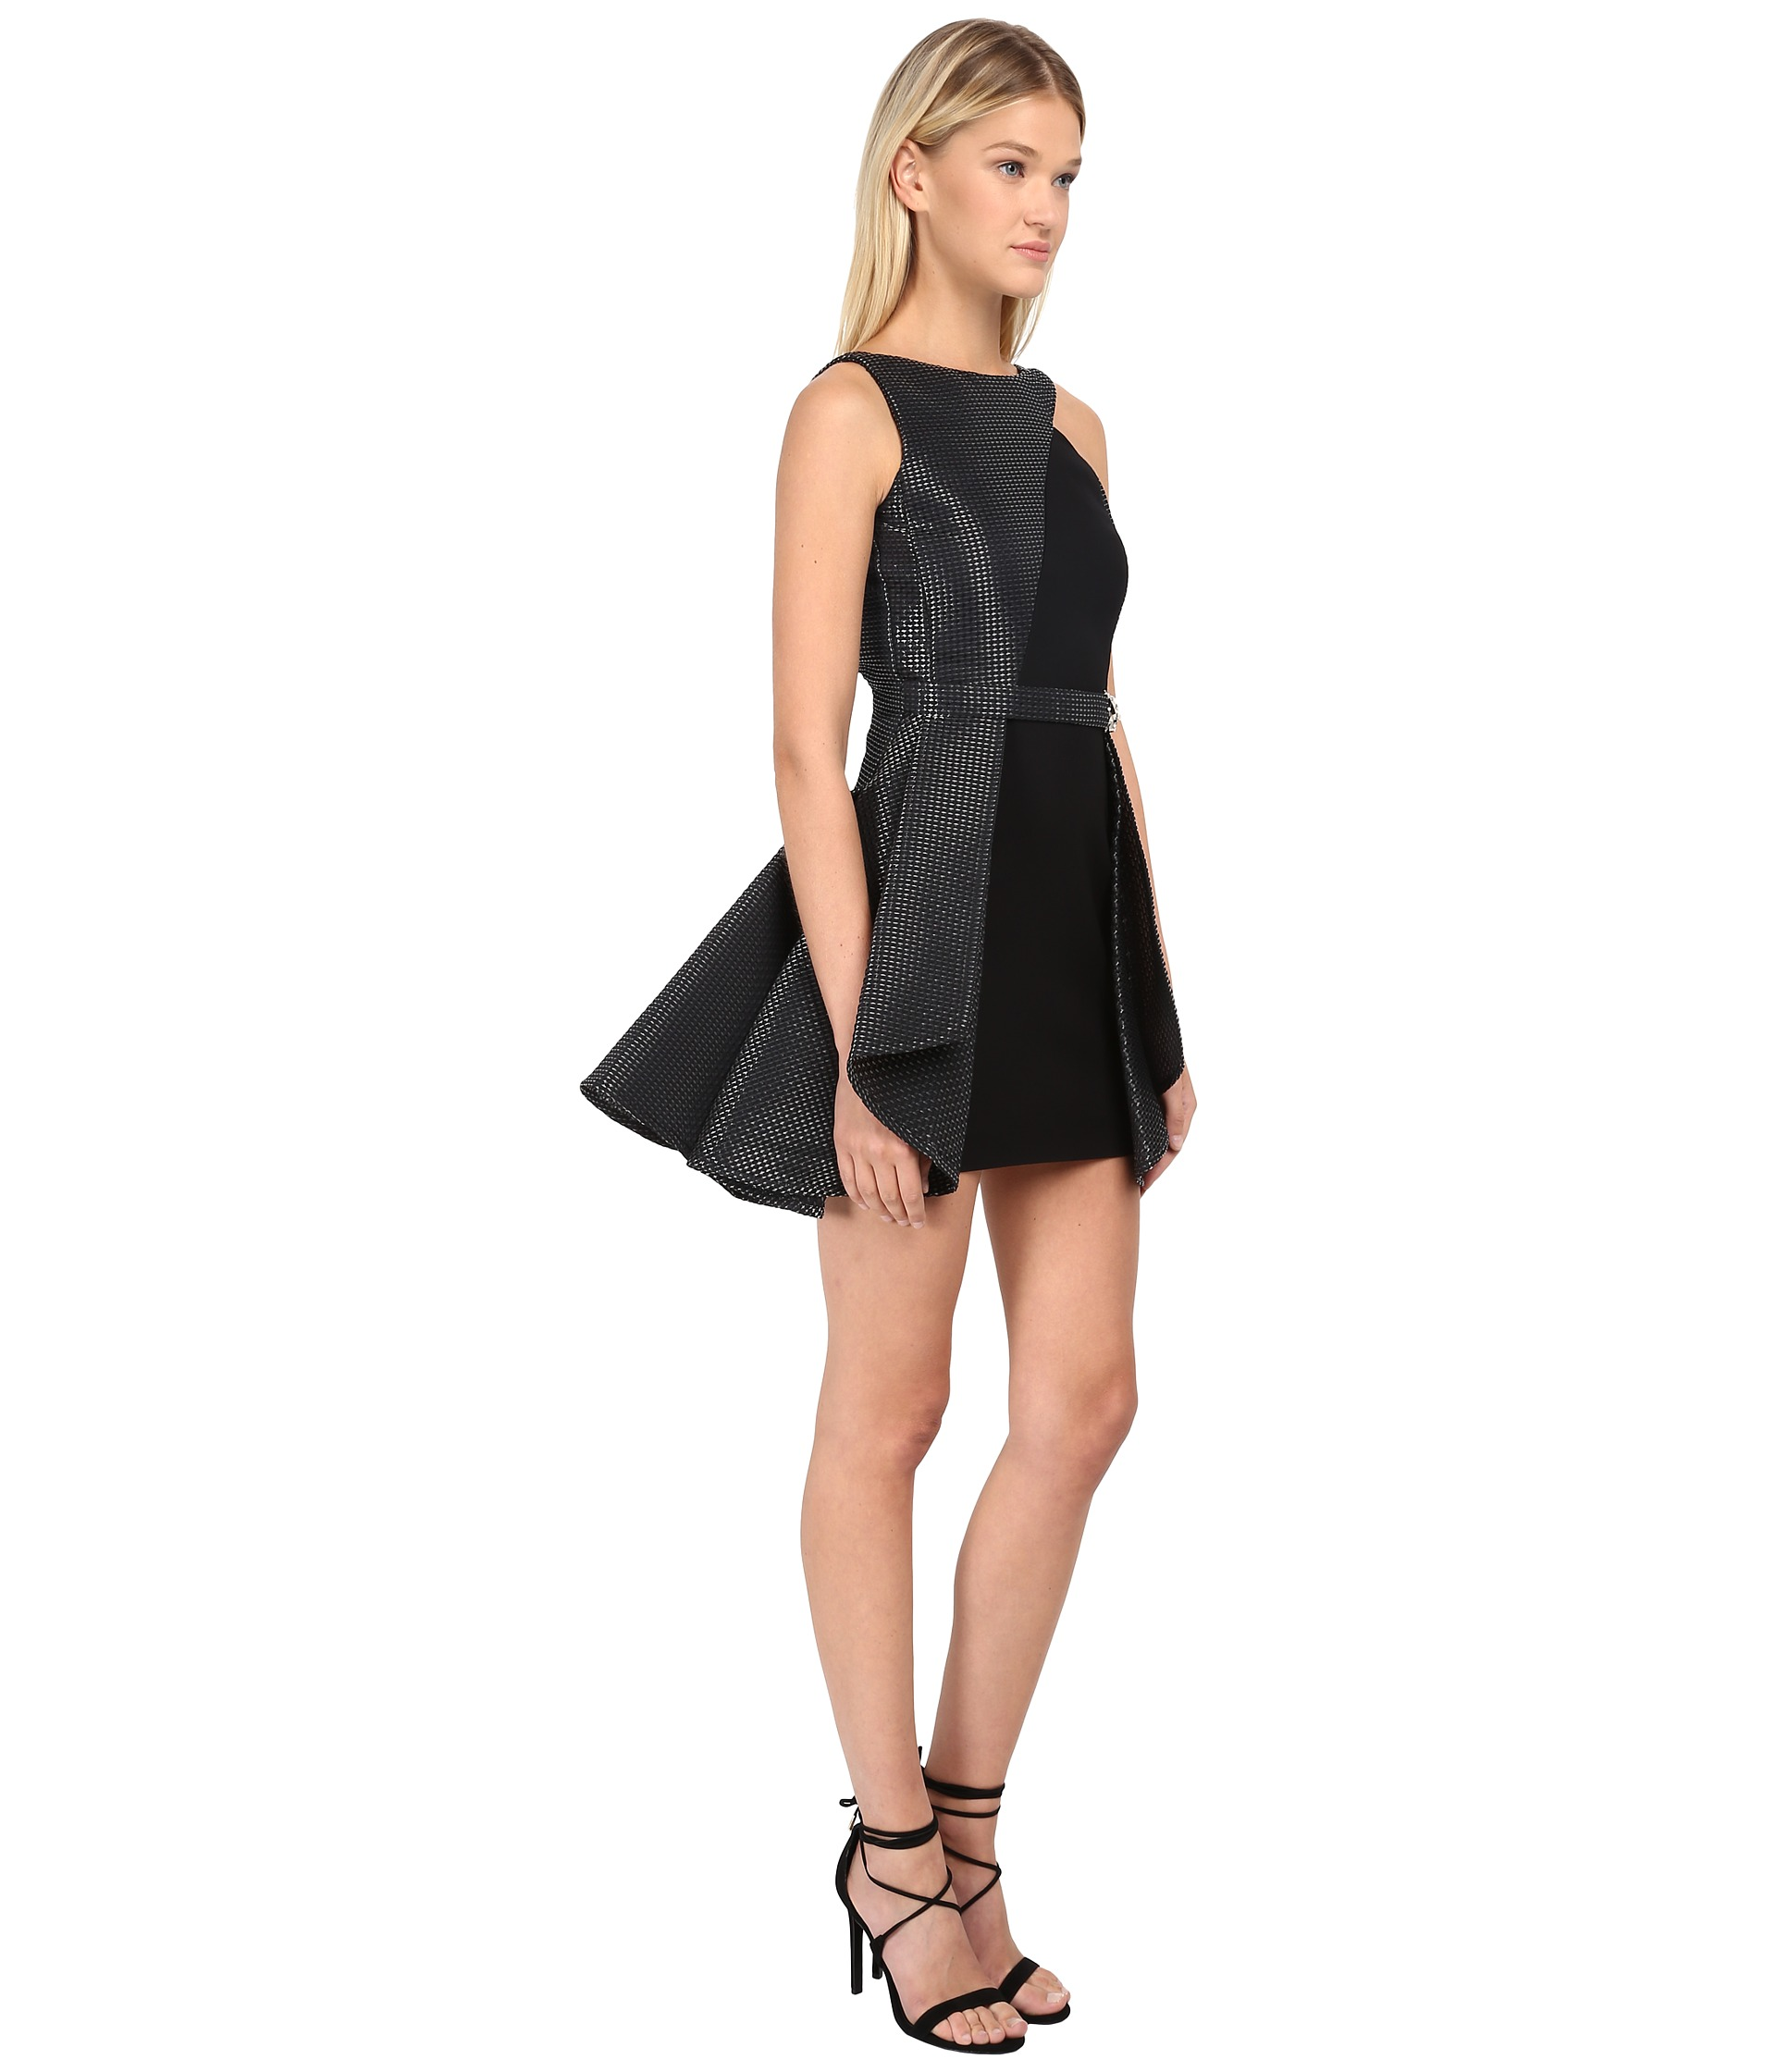 philipp plein dress company black free shipping both ways. Black Bedroom Furniture Sets. Home Design Ideas